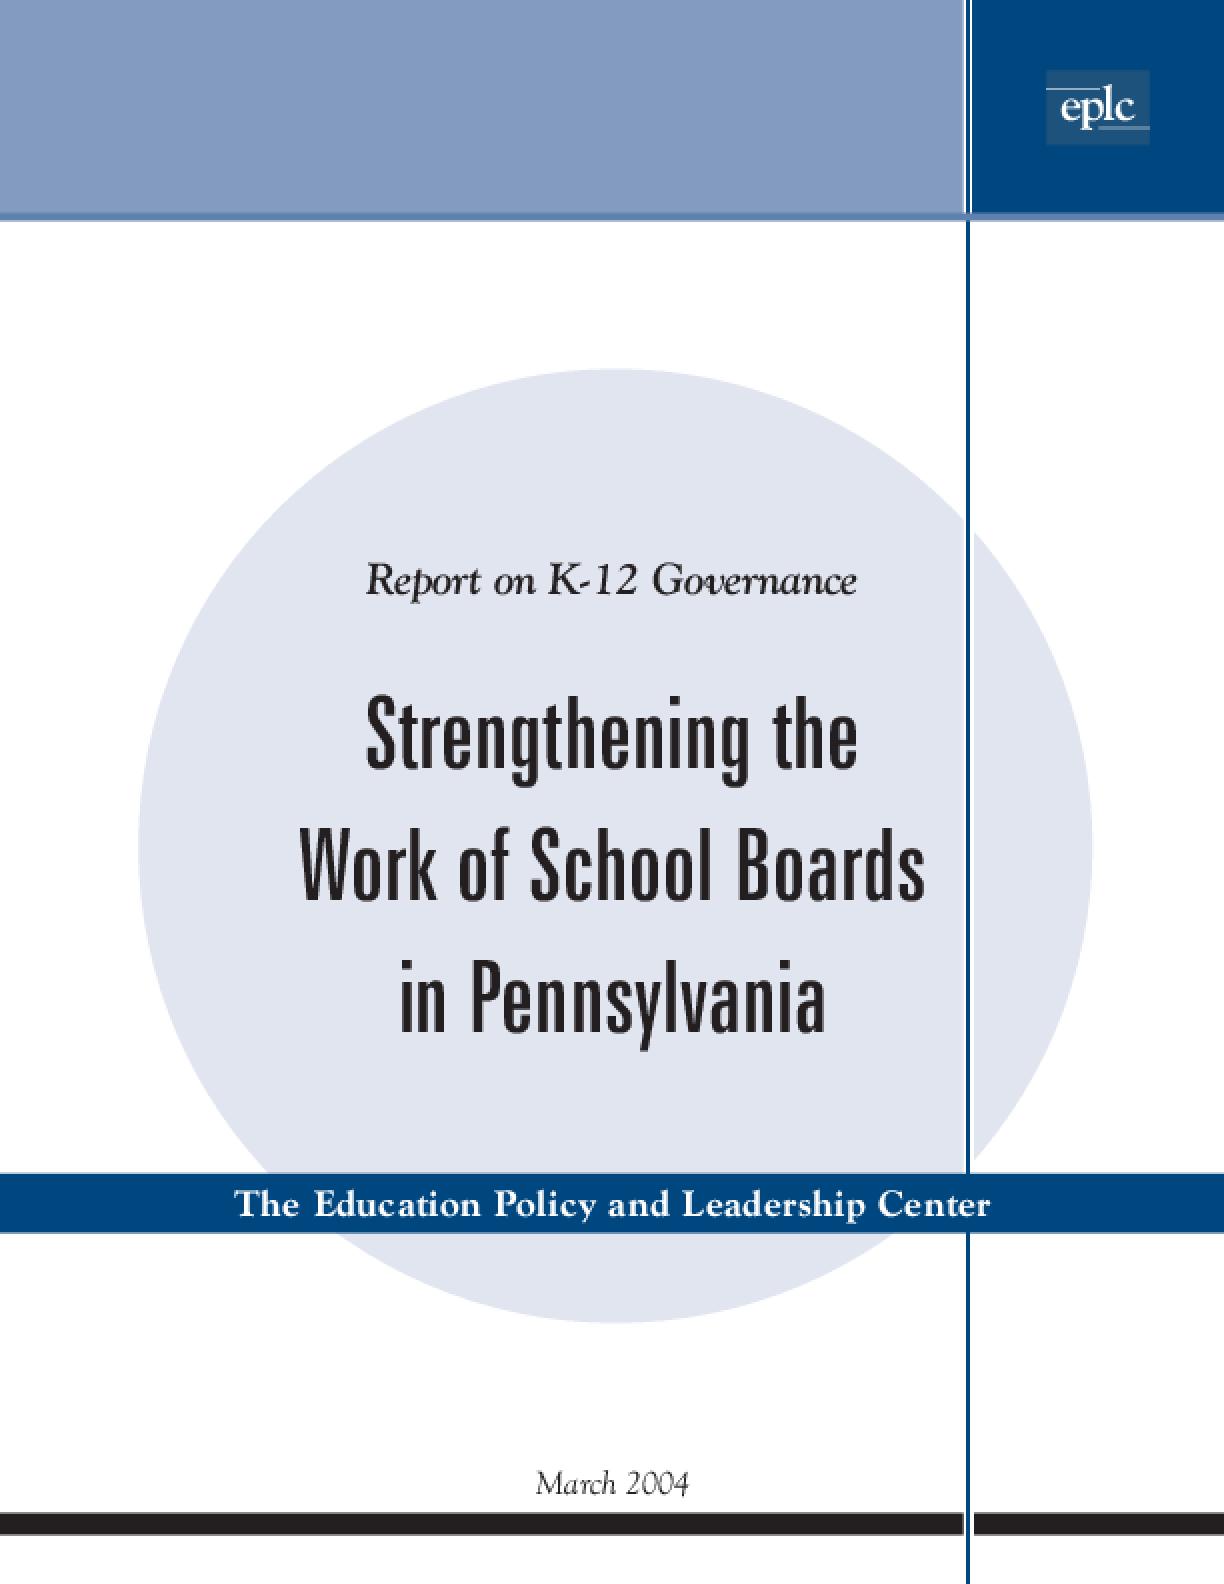 Strengthening the Work of School Boards in Pennsylvania